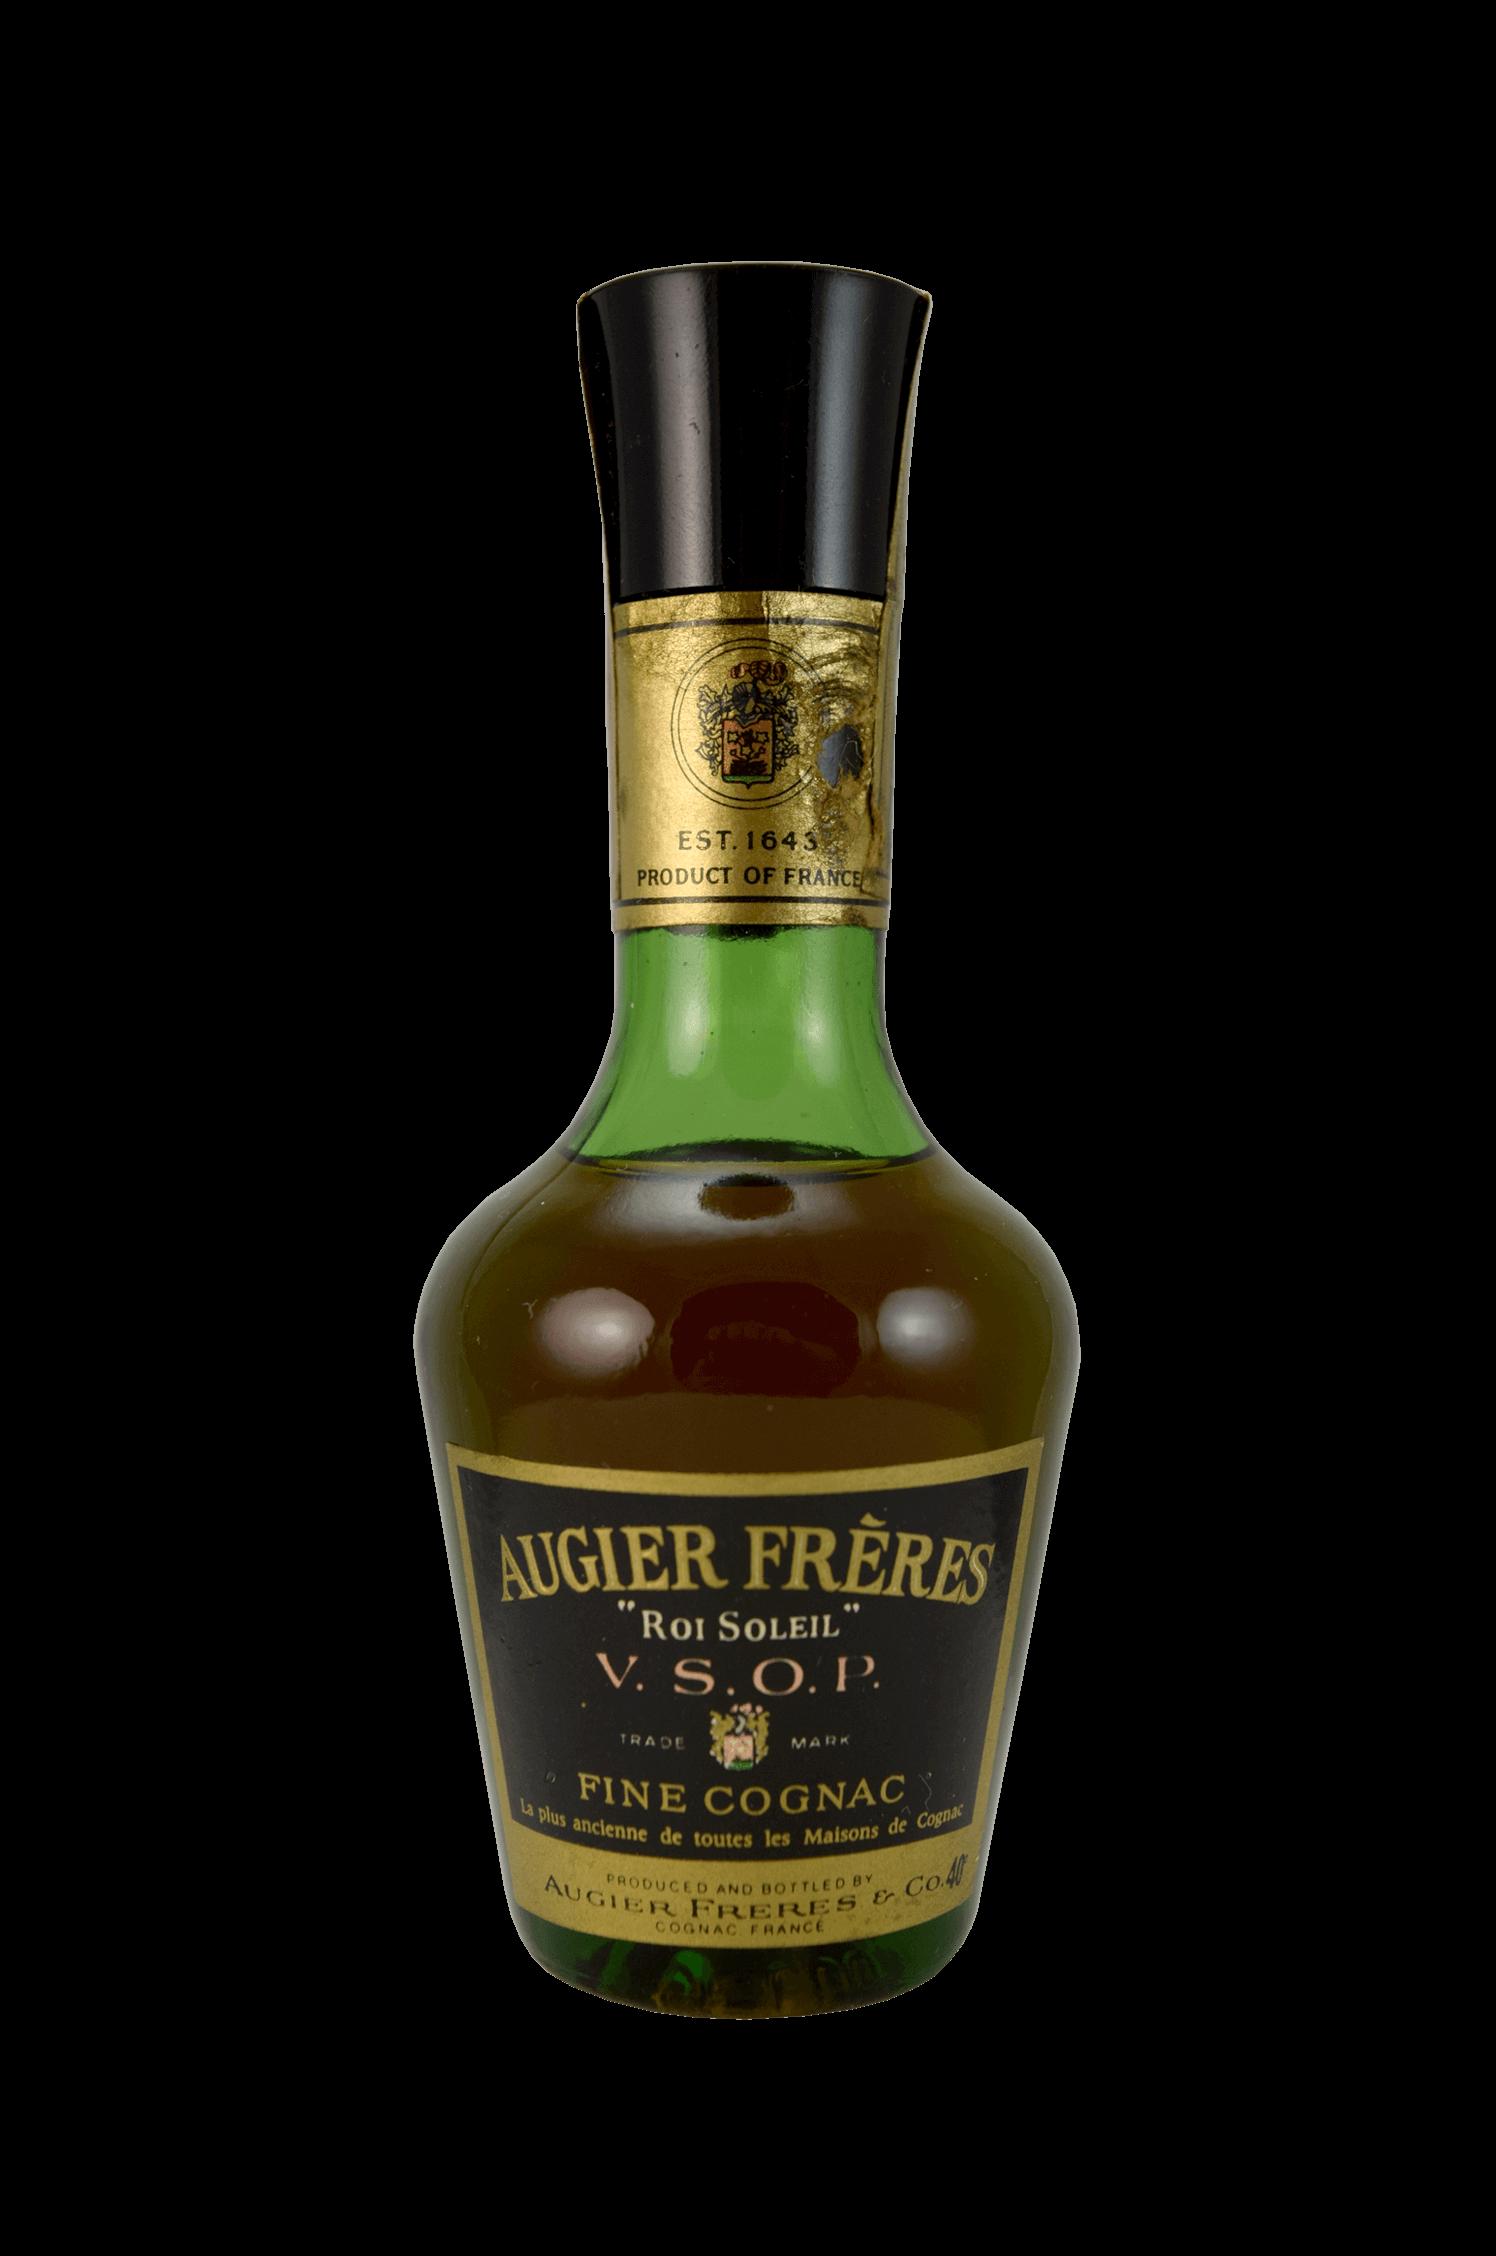 Augier Fréres V.S.O.P. Fine Cognac